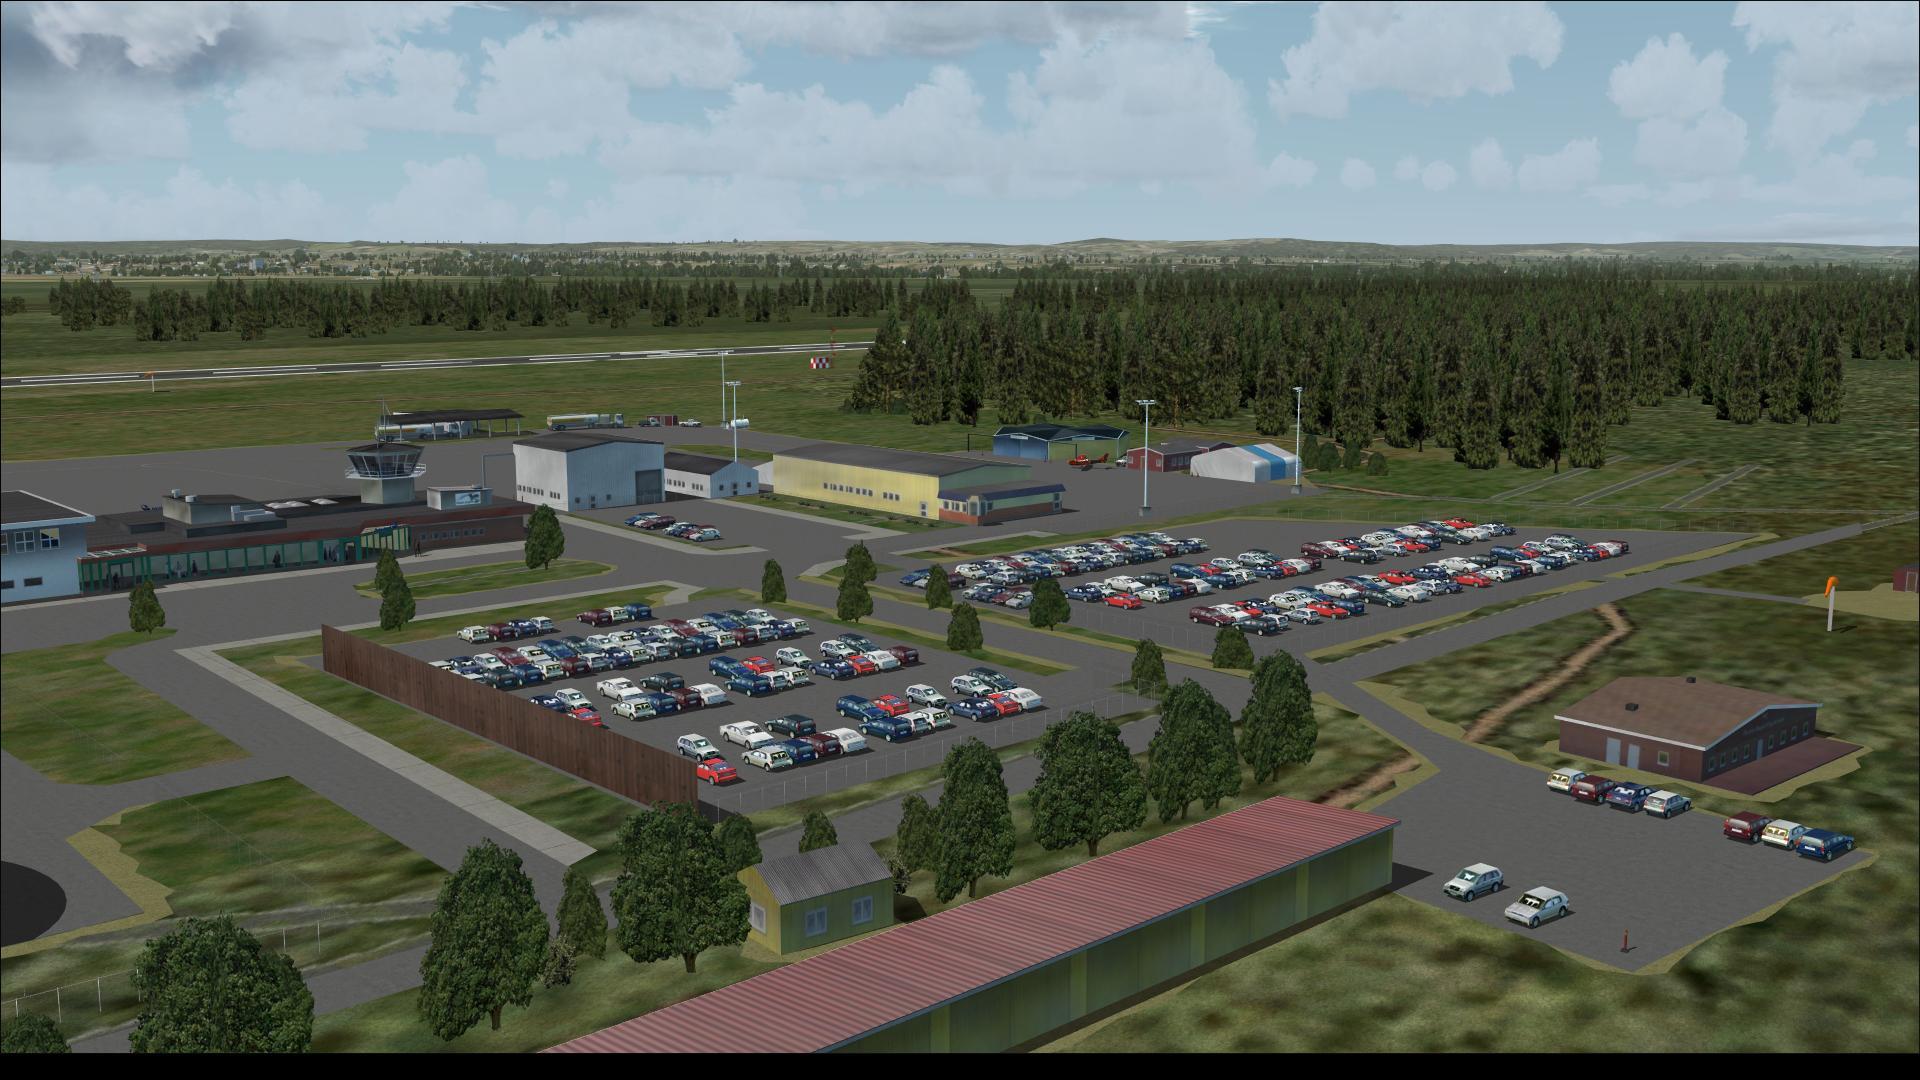 Örebro Airport - ESOE - Free scenery for Microsoft Flight